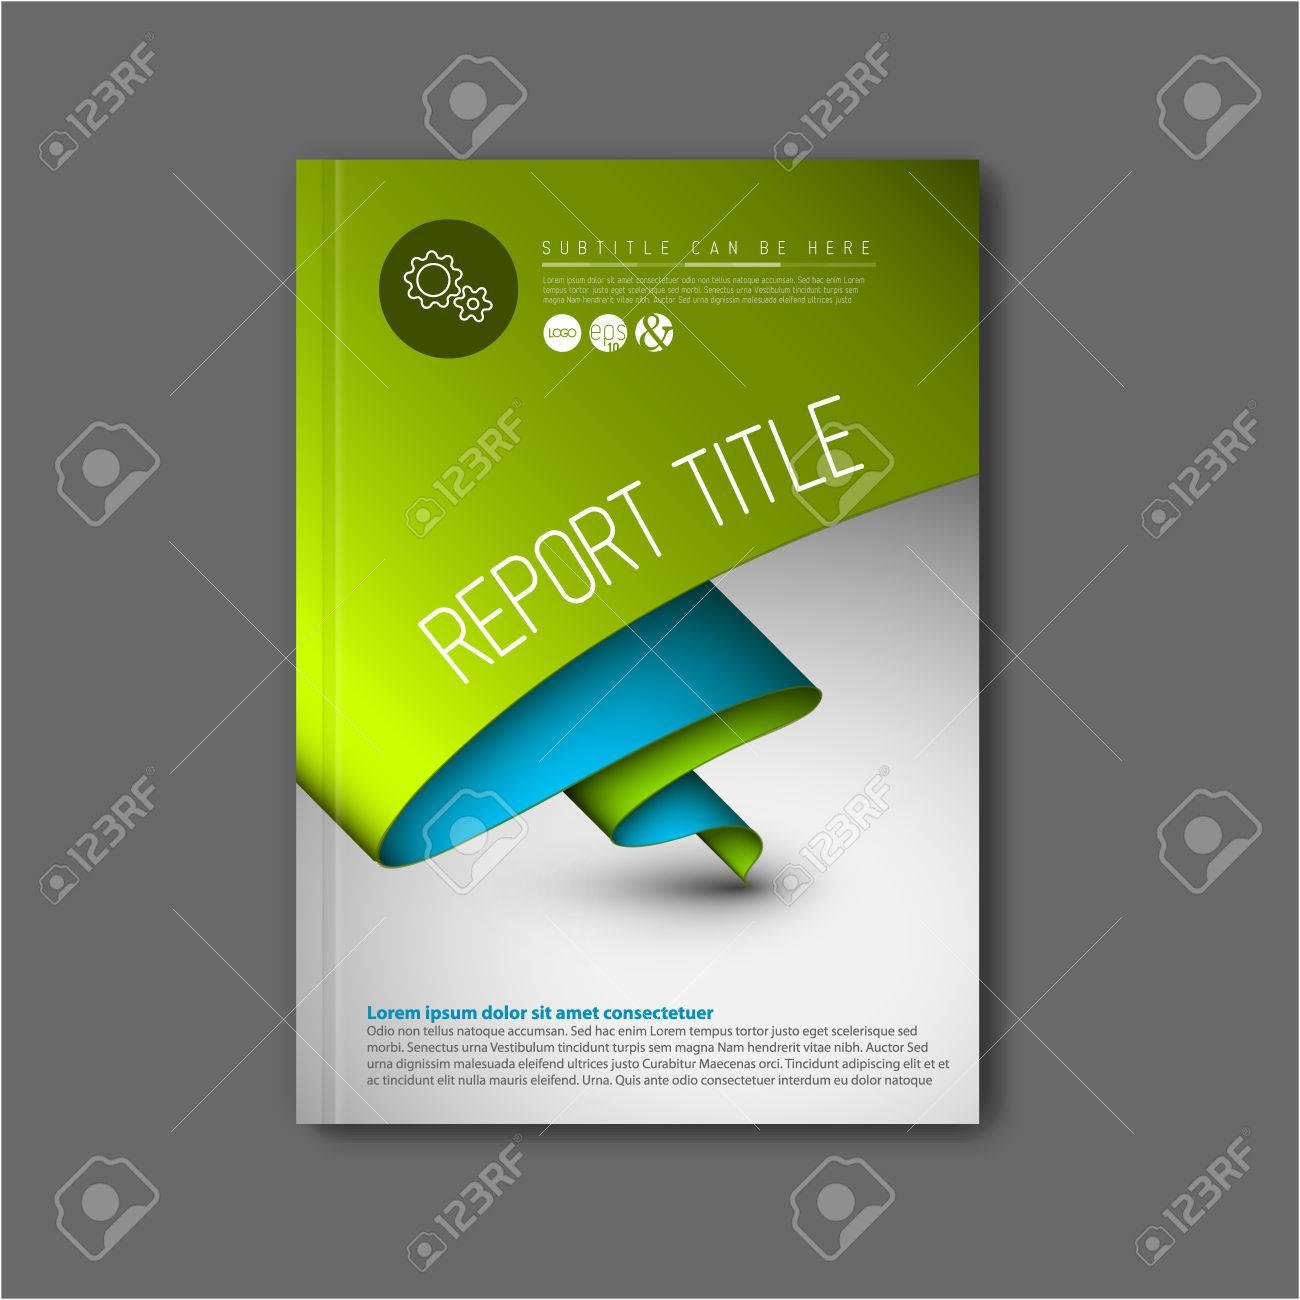 Modern Vector Abstract Brochure / Book / Flyer Design Template ...